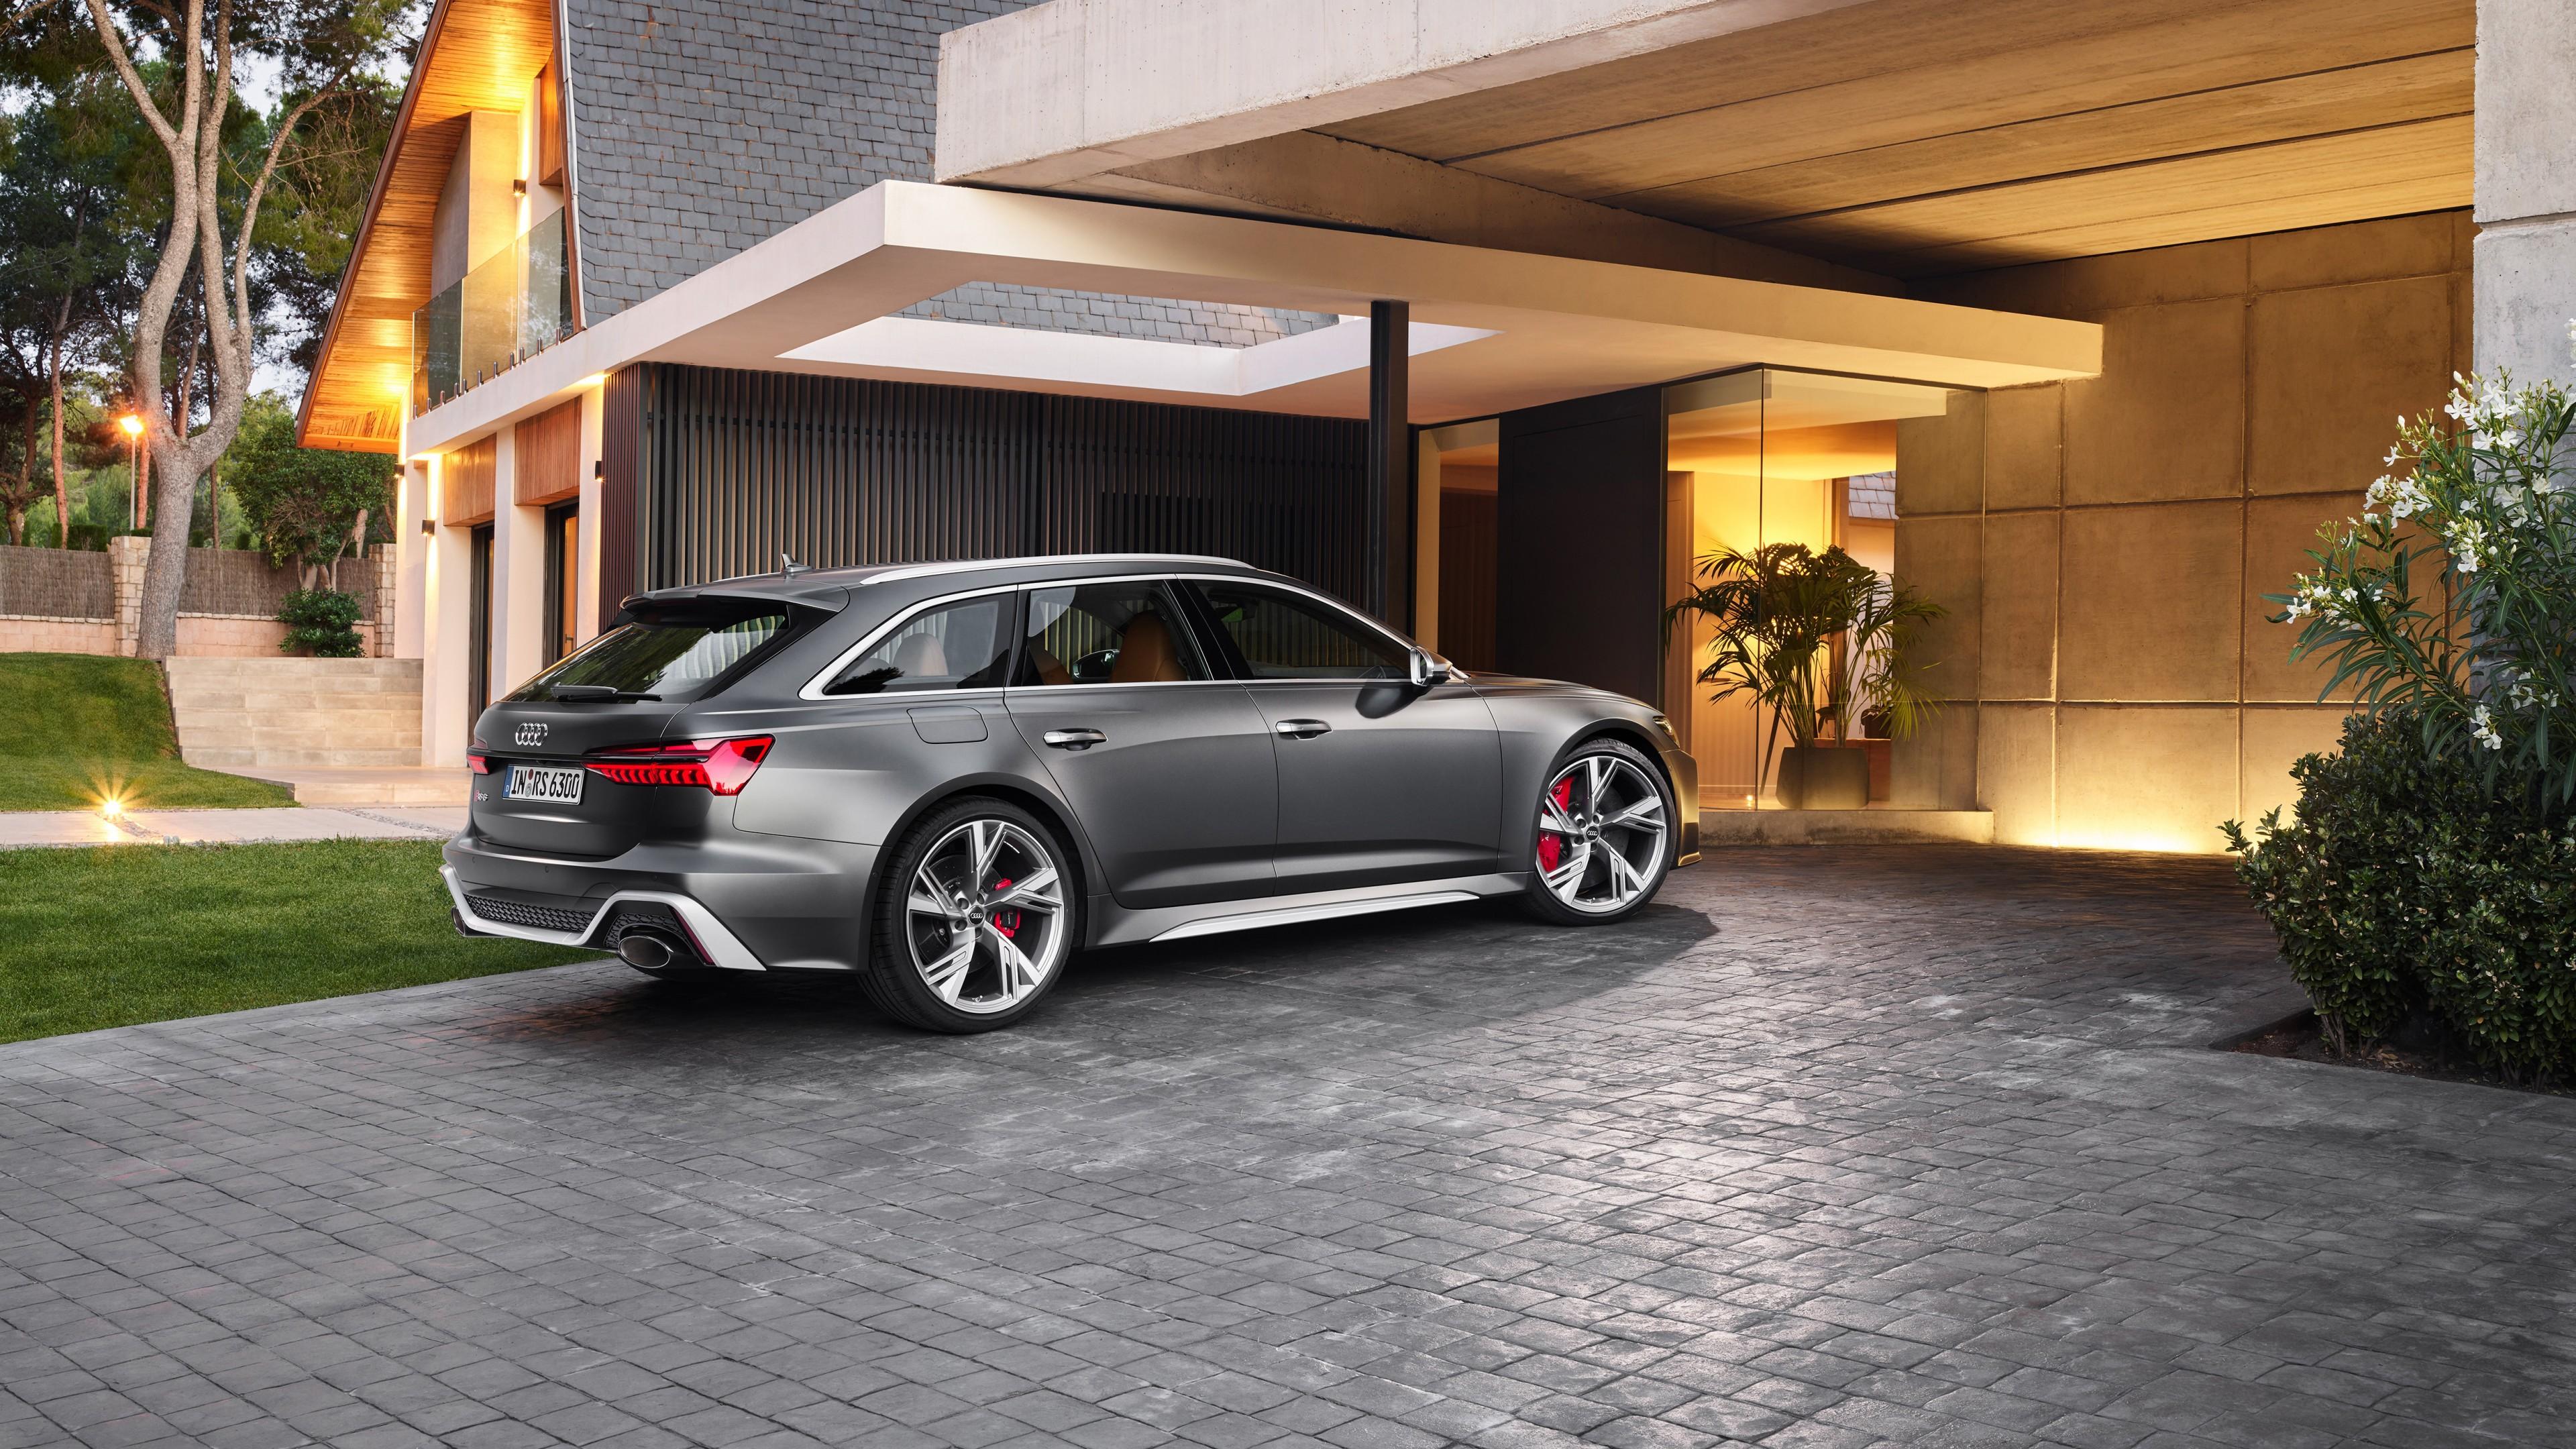 Audi, Audi RS6 Avant, luxury cars   3840x2160 Wallpaper ...